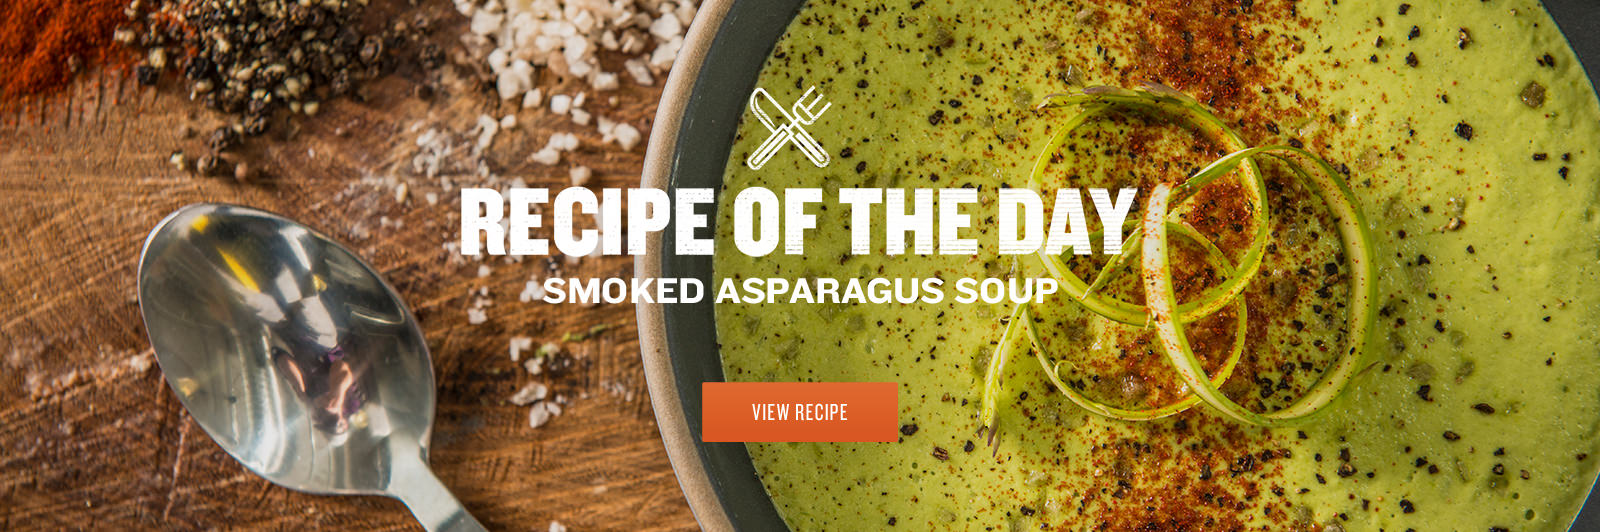 Smoked Asparagus Soup